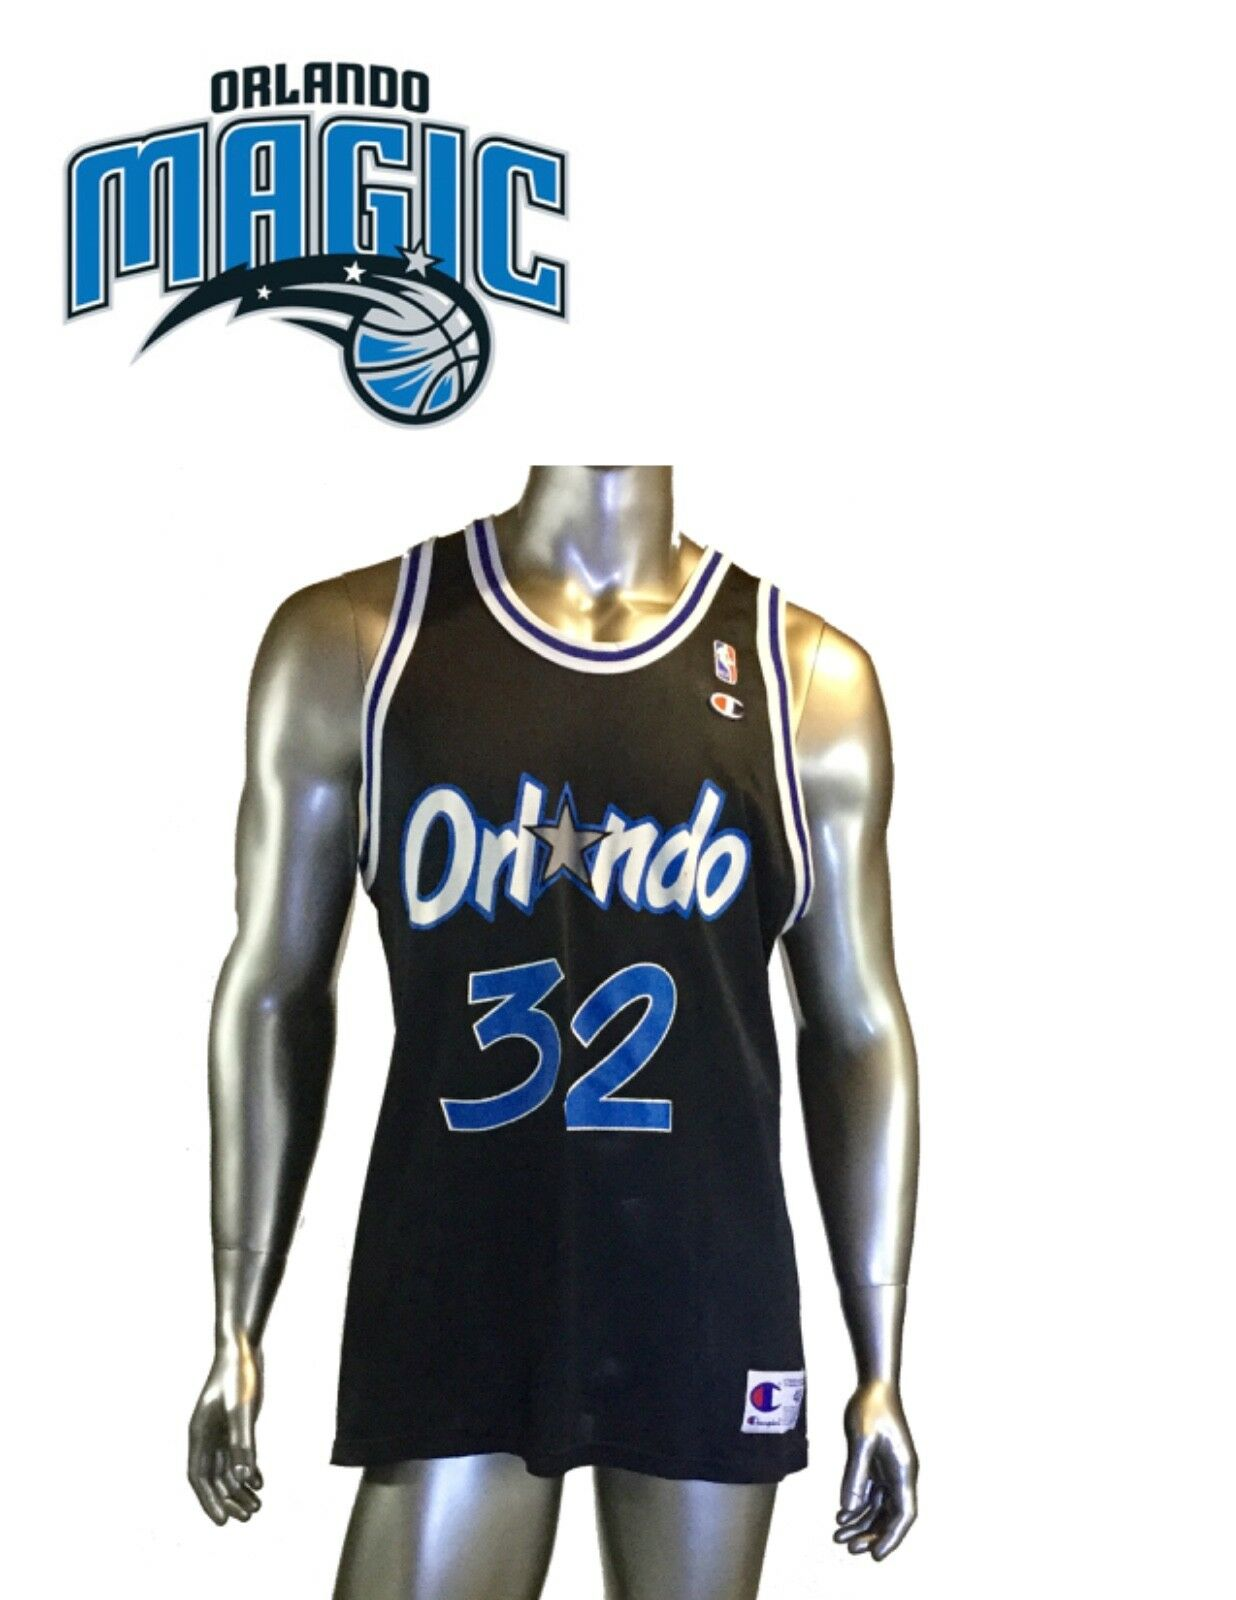 Vintage NBA NBA NBA Orlando Magic  32 Shaquille O'Neal Champion Print Jersey USA, db801f